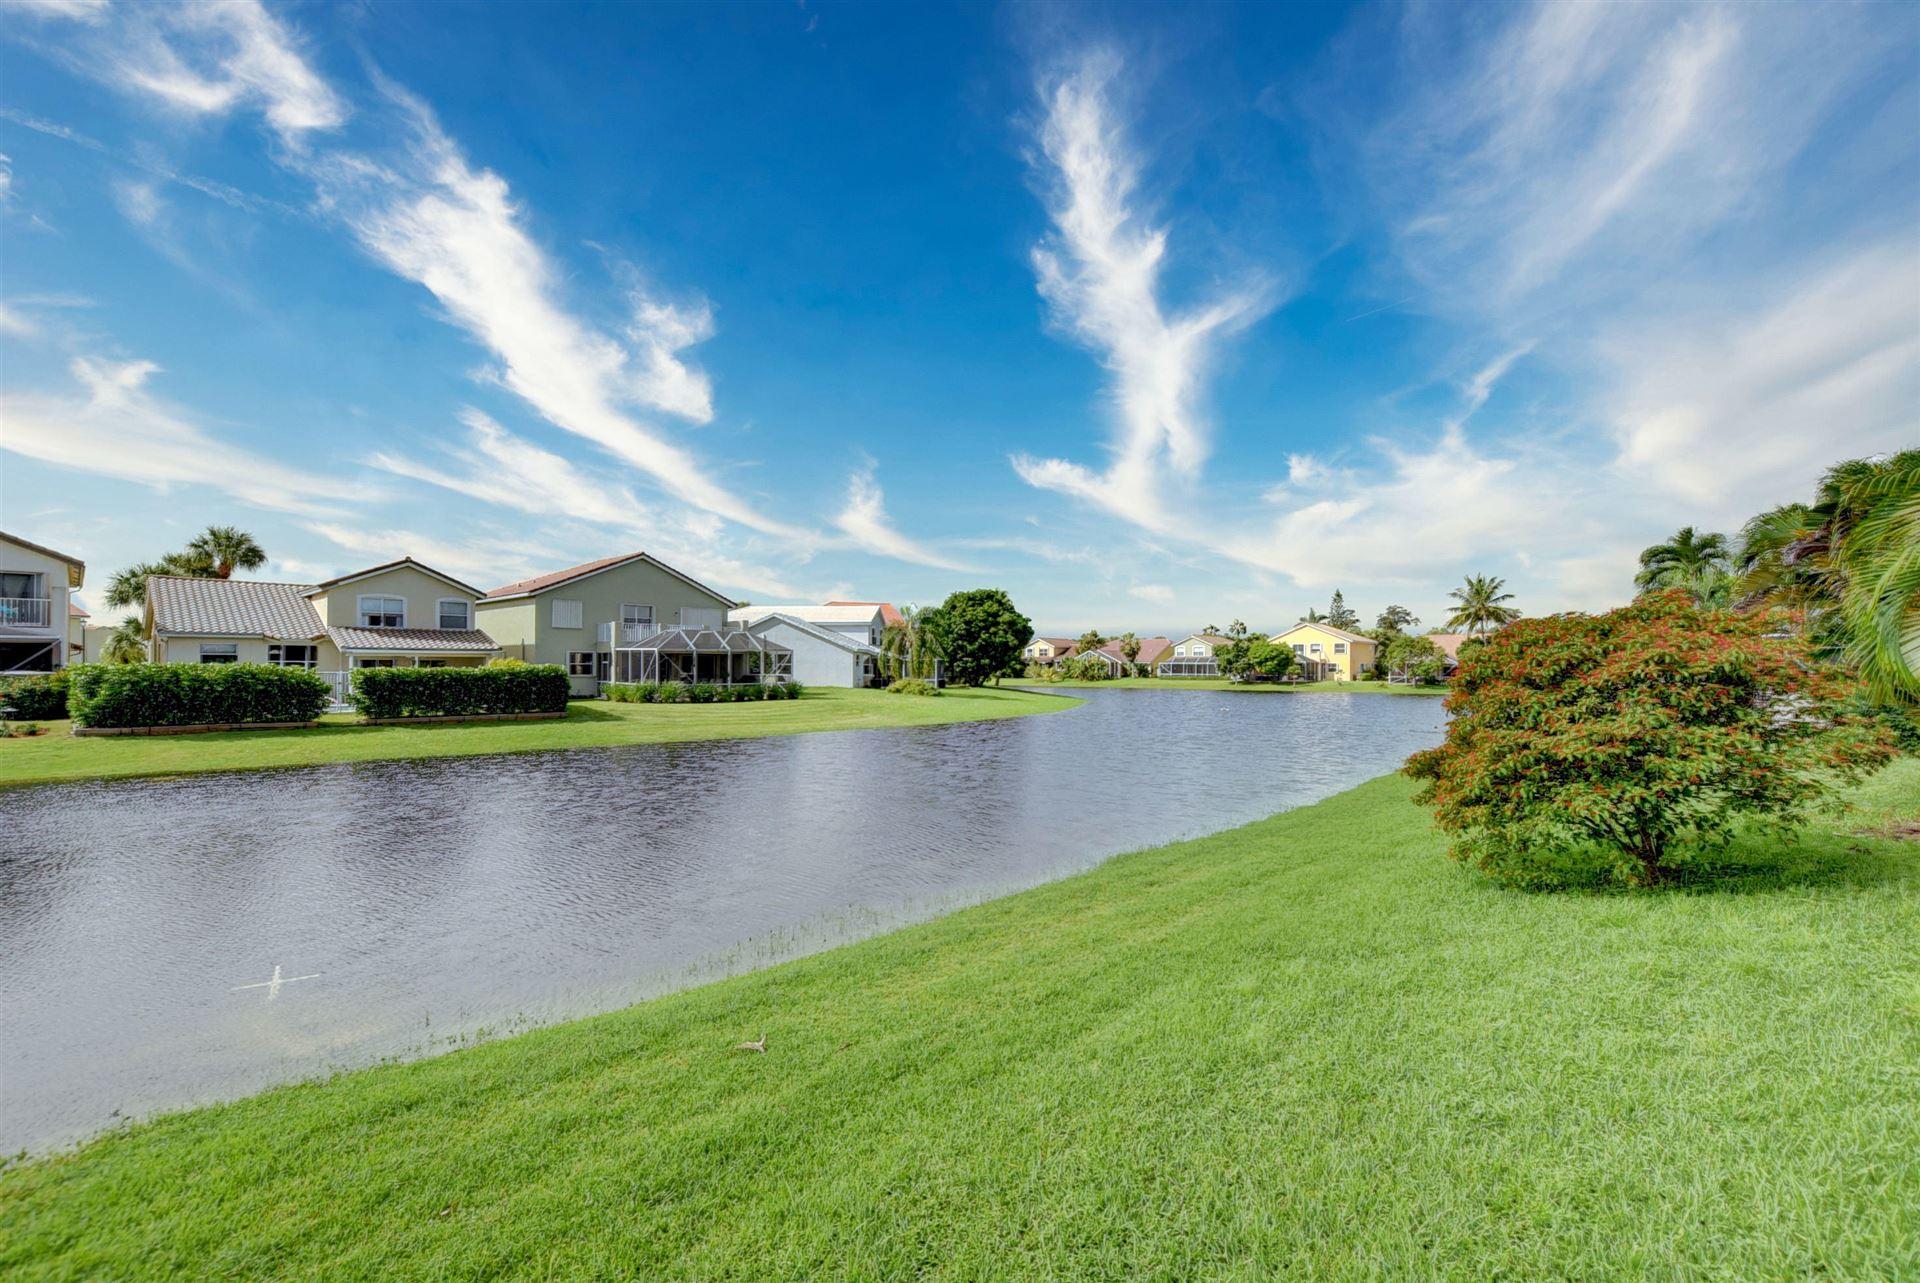 Photo of 18161 Clear Brook Circle, Boca Raton, FL 33498 (MLS # RX-10657478)